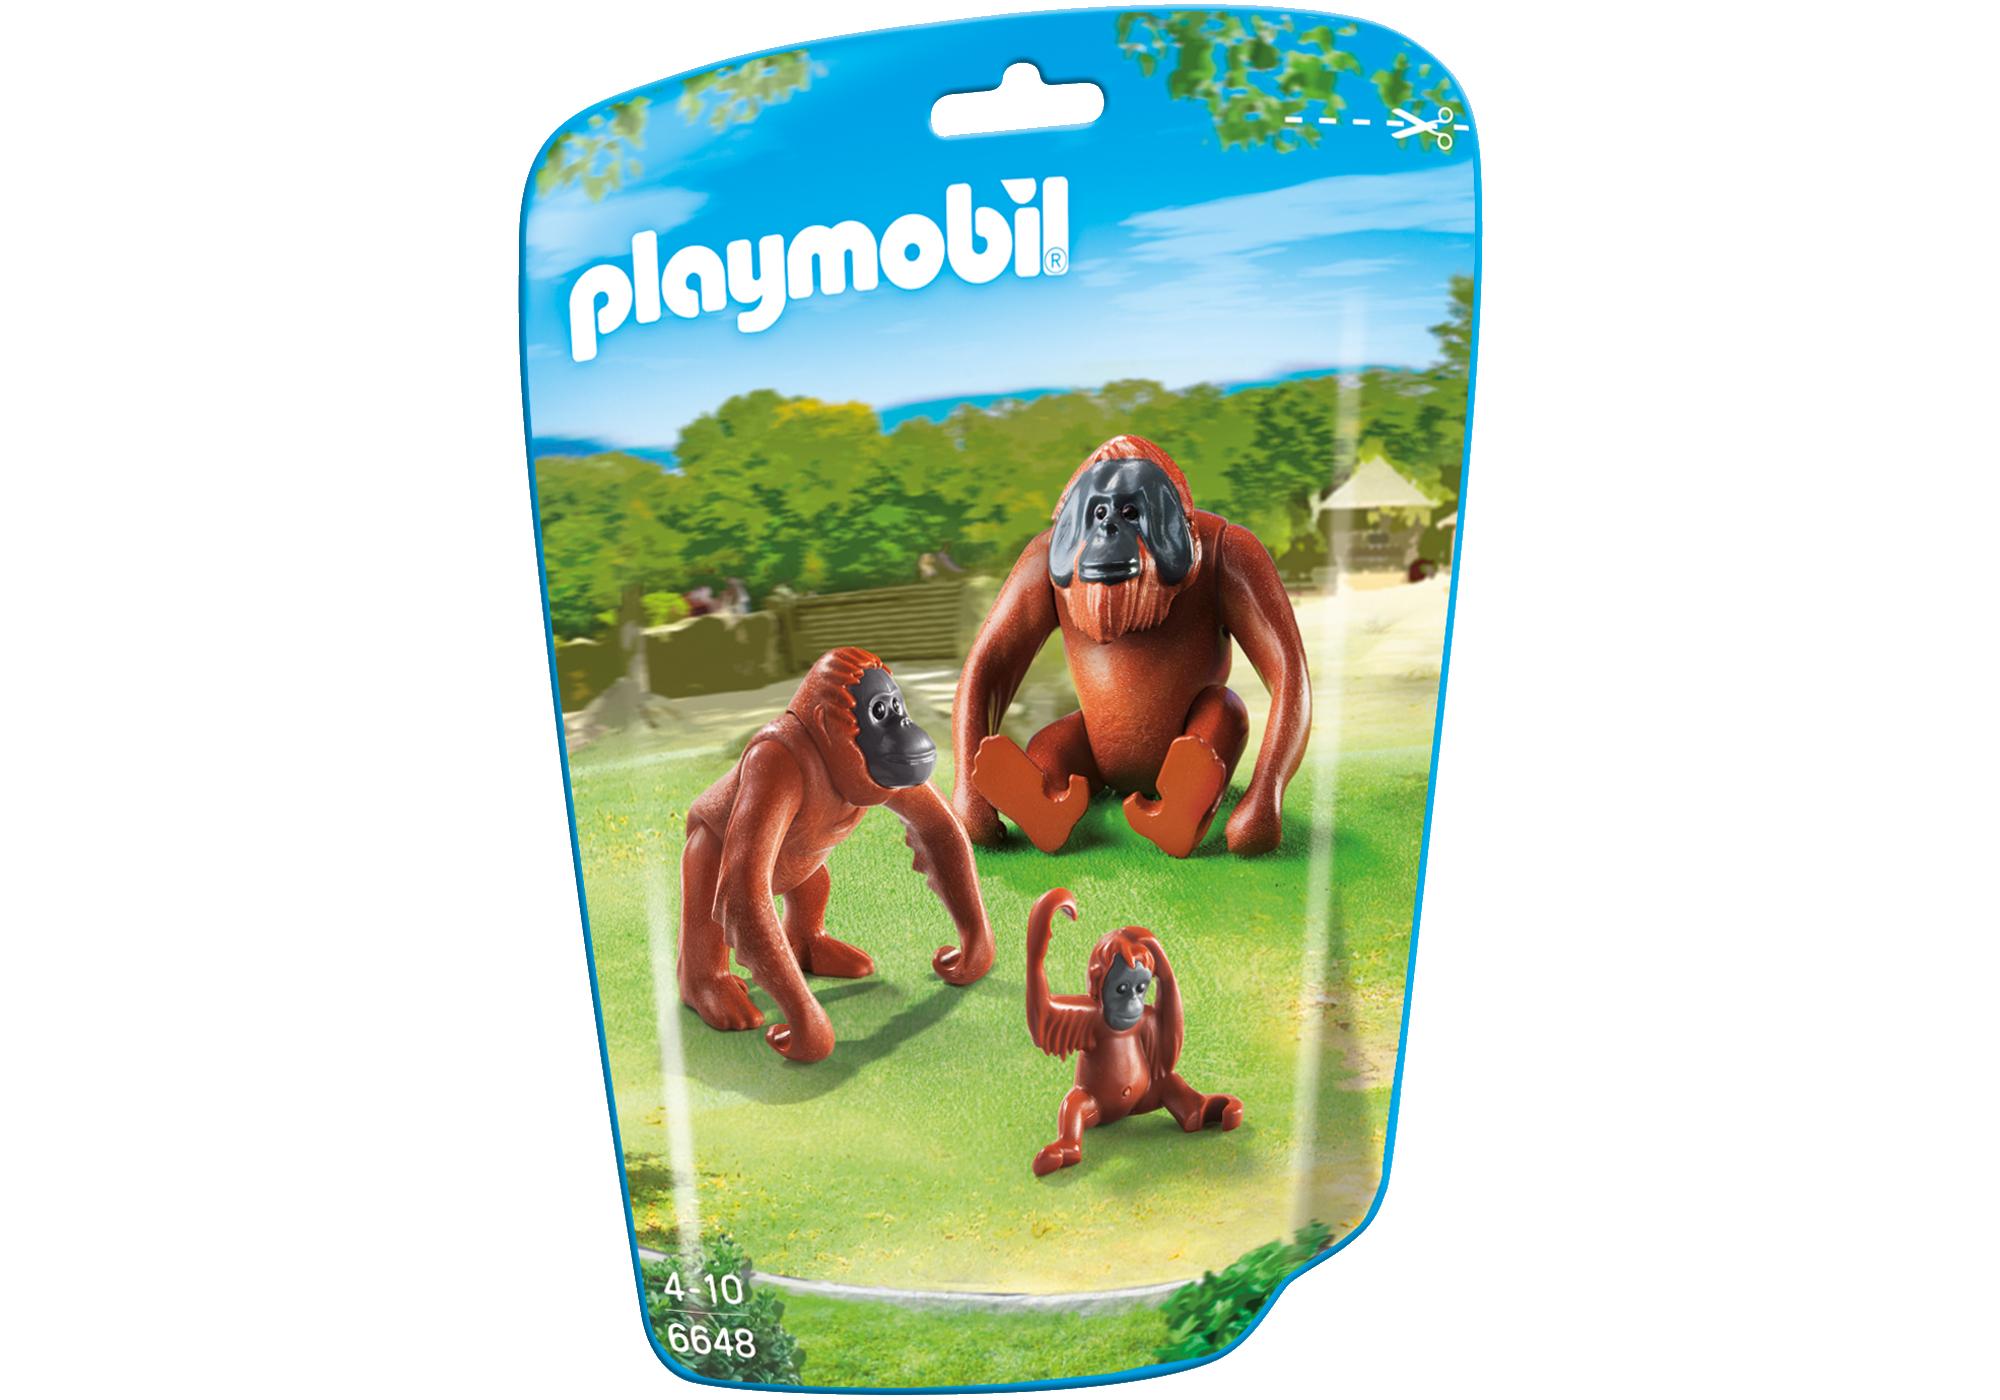 http://media.playmobil.com/i/playmobil/6648_product_box_front/Familia de Orangutanes